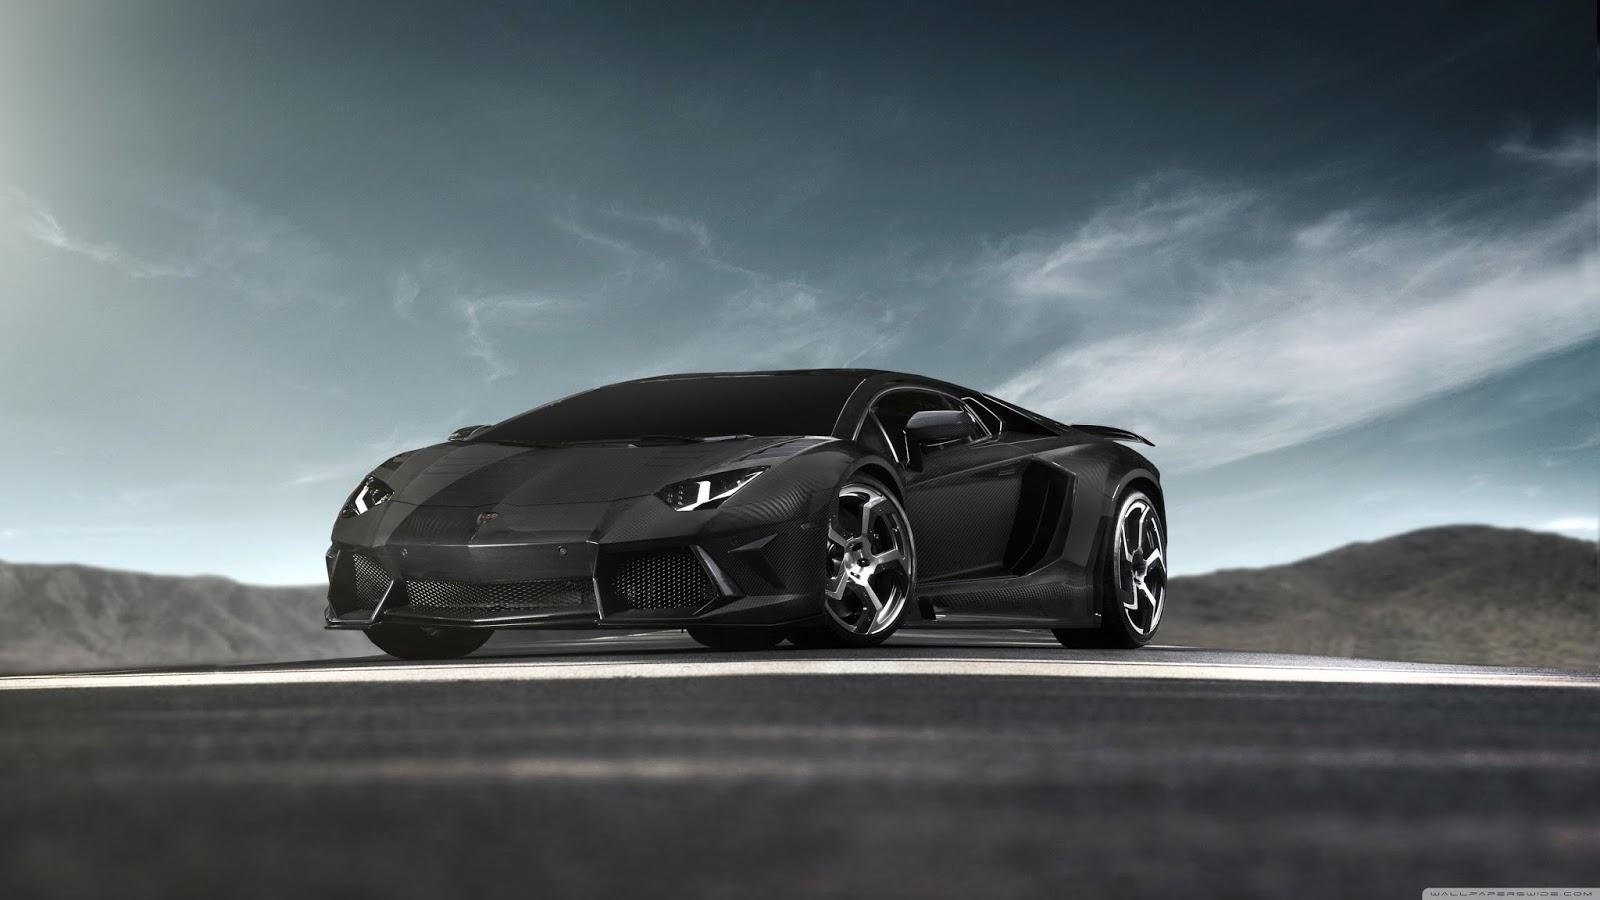 Black Lamborghini Aventador Super Car   Ultra HD Car Wallpapers For Desktop